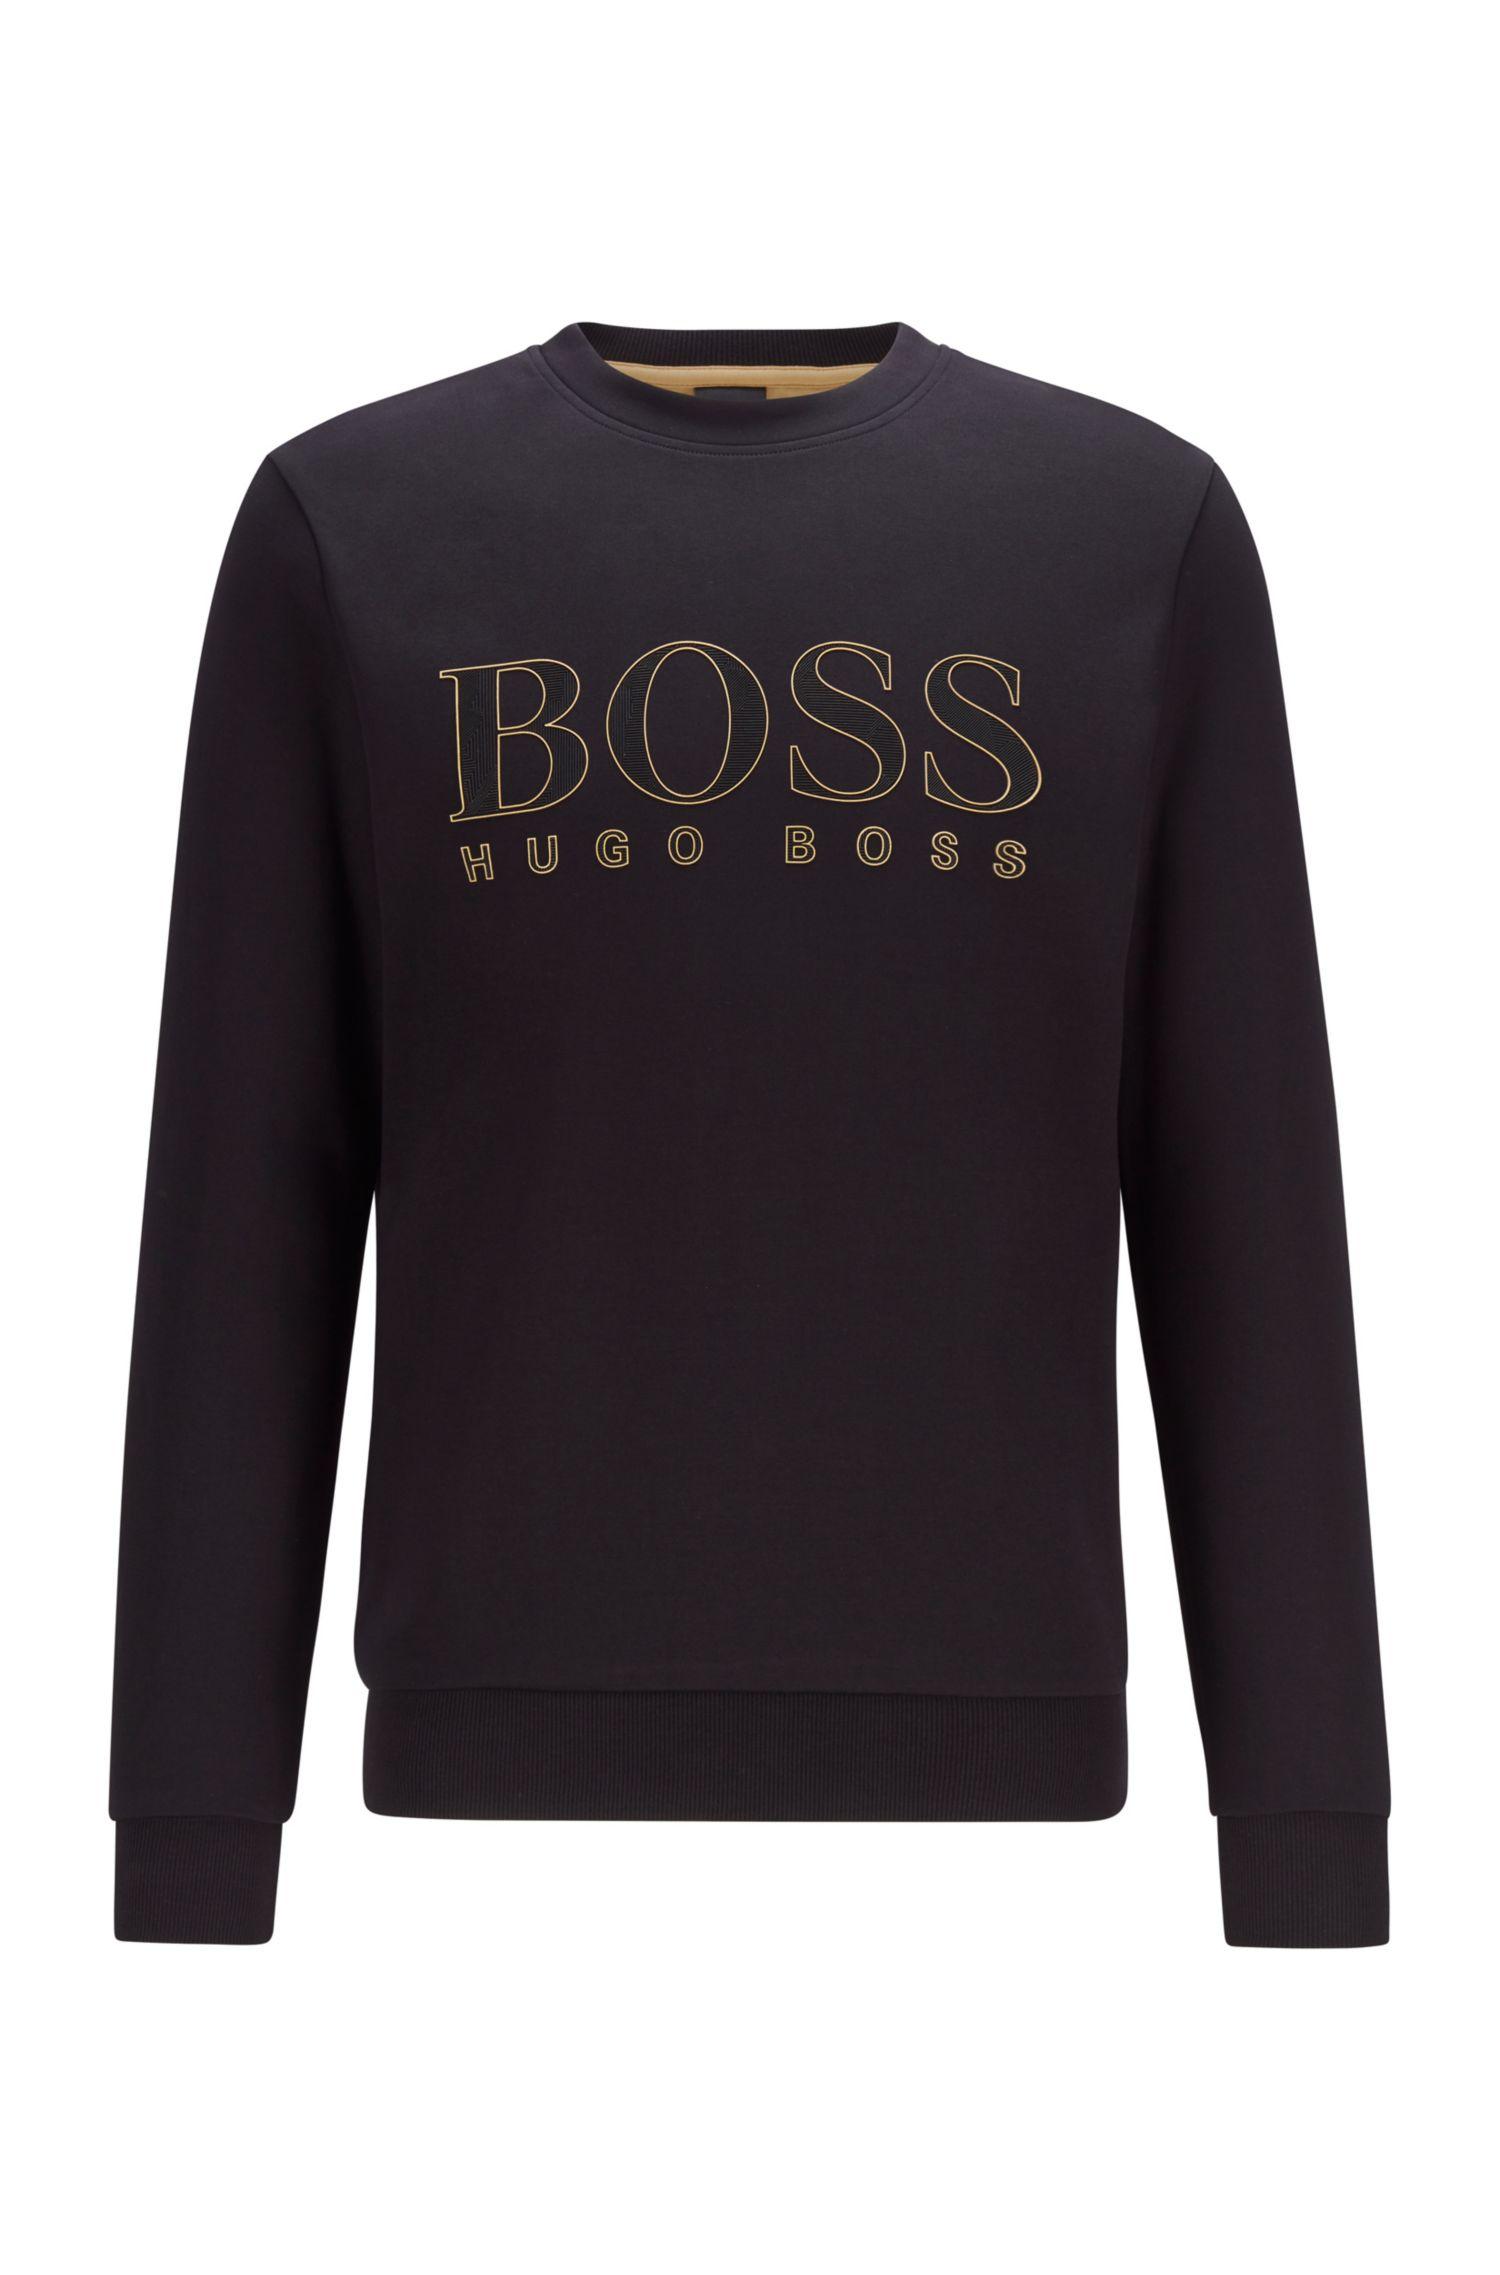 Slim fit sweatshirt in woven cotton blend with printed logo BOSS | Sweatshirt | 50448186001